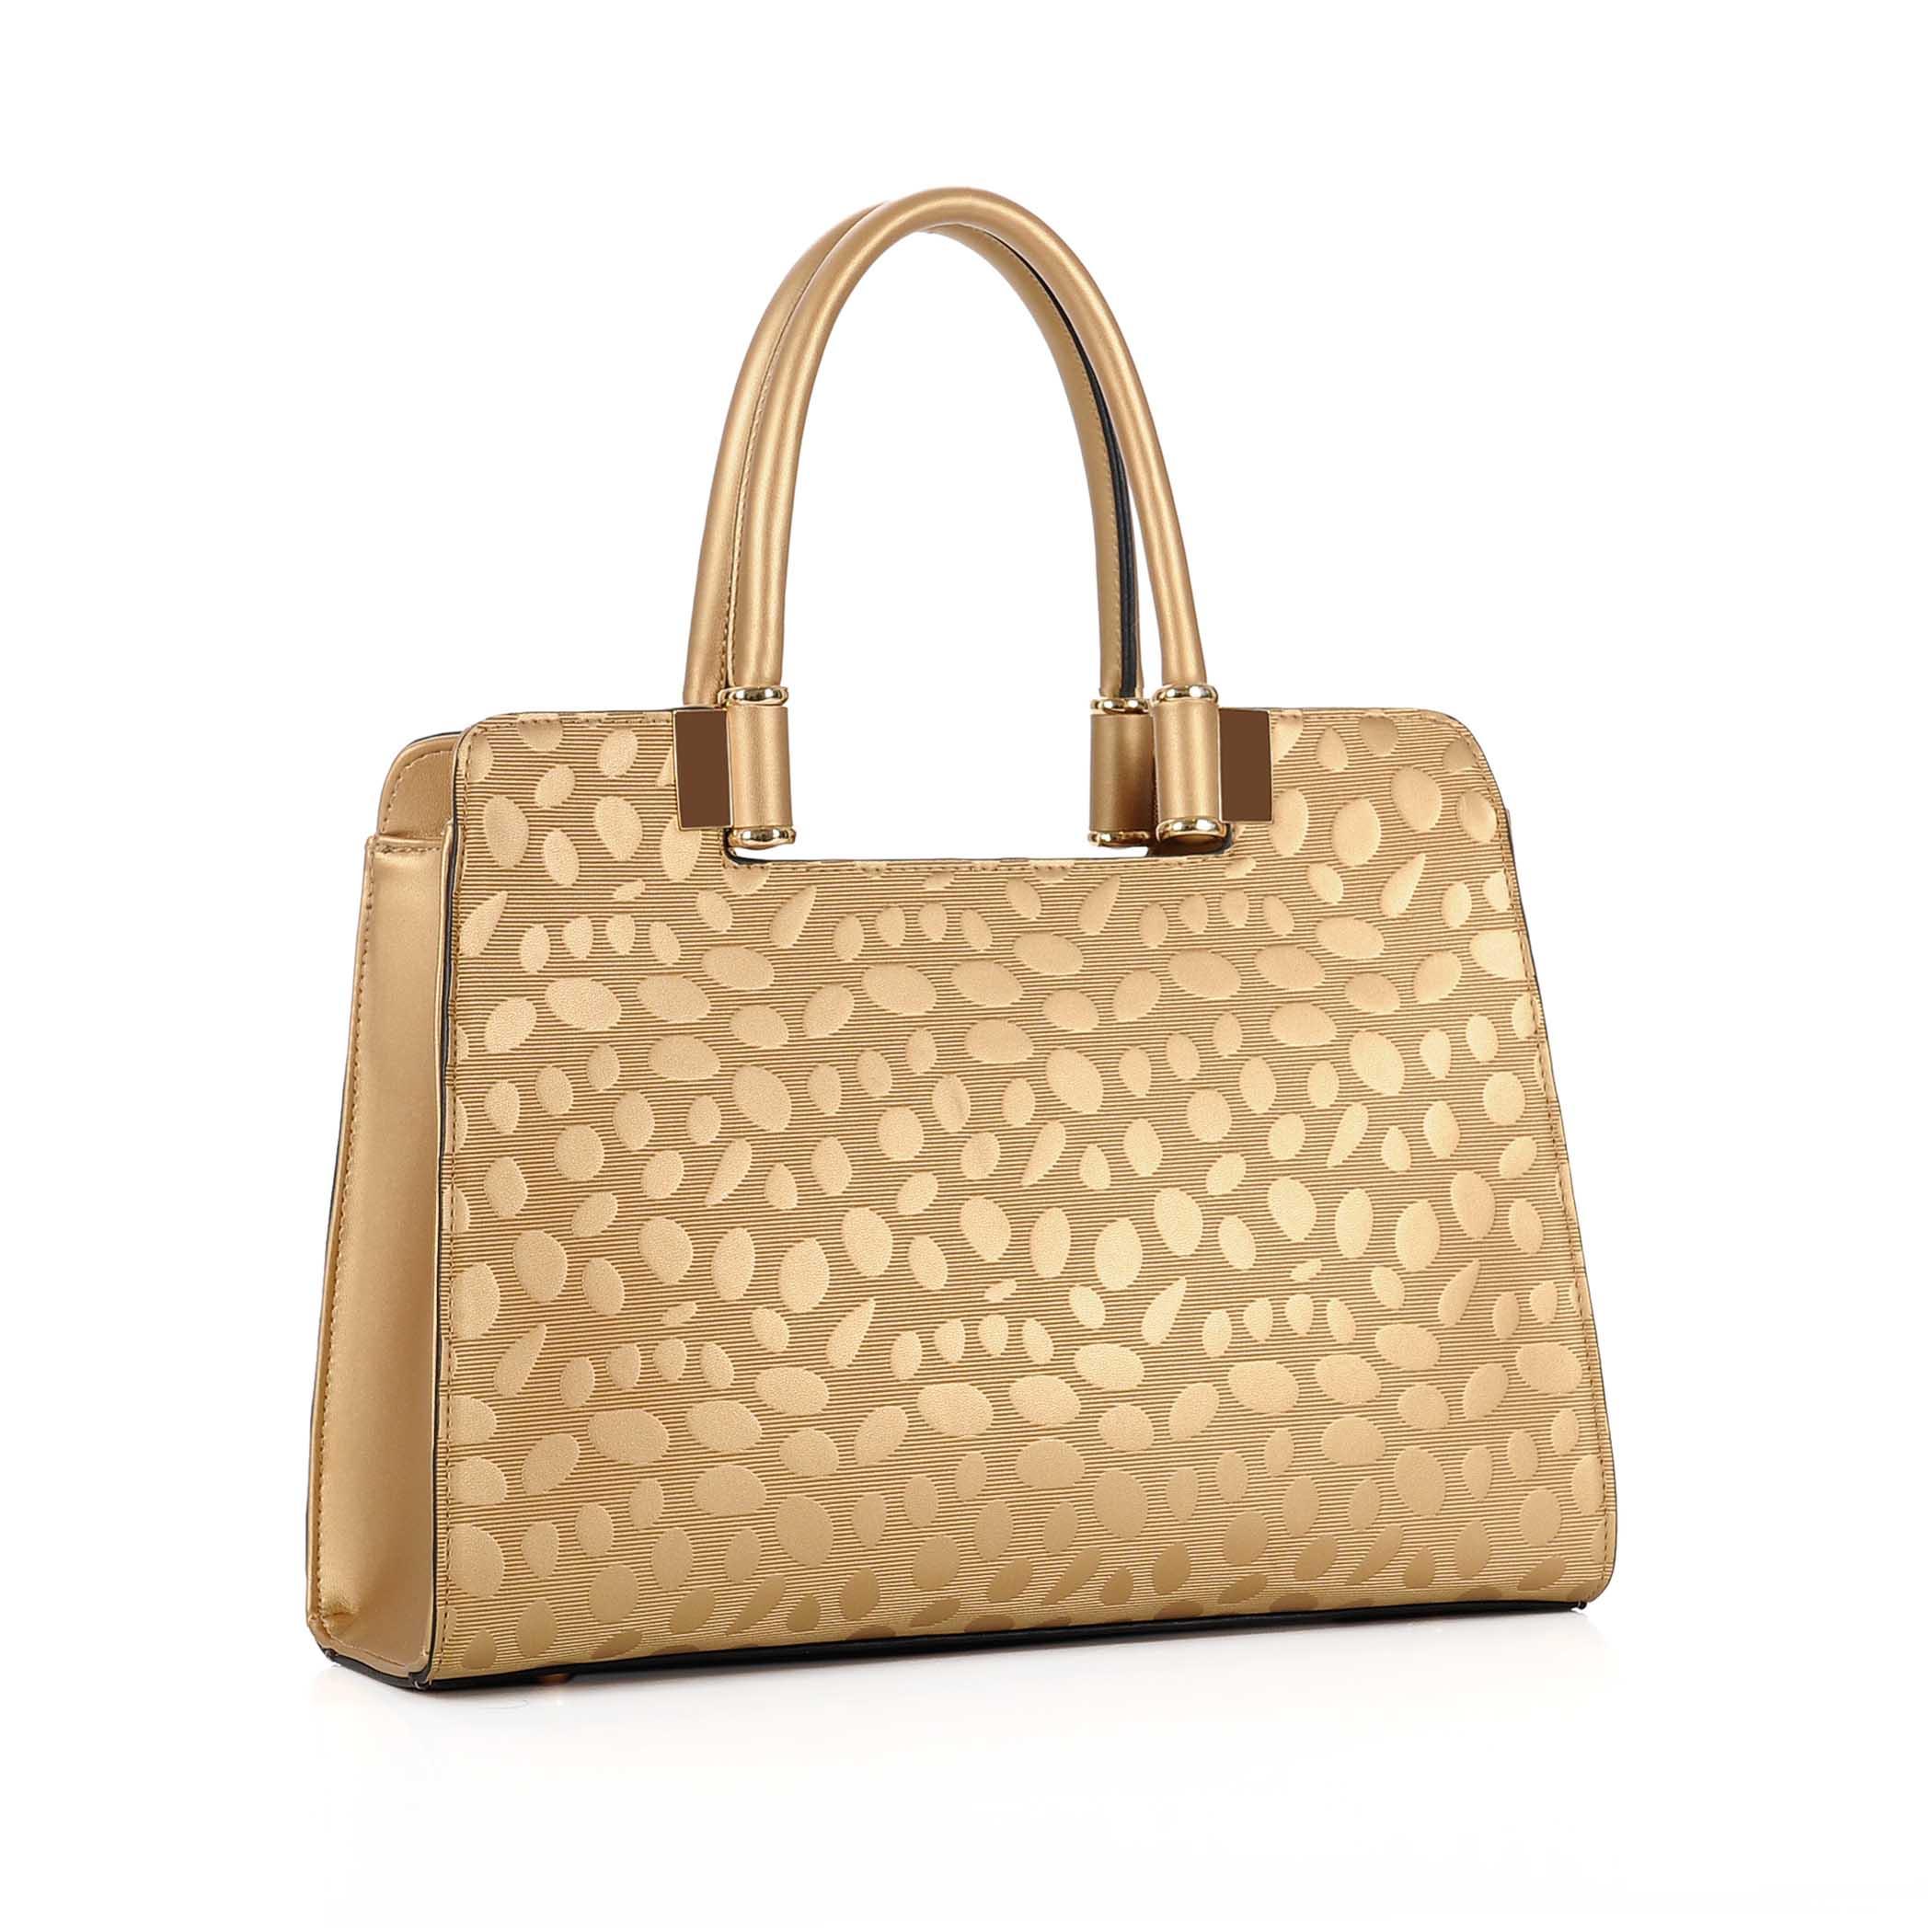 New fashion bags cheap designer handbags women jpg